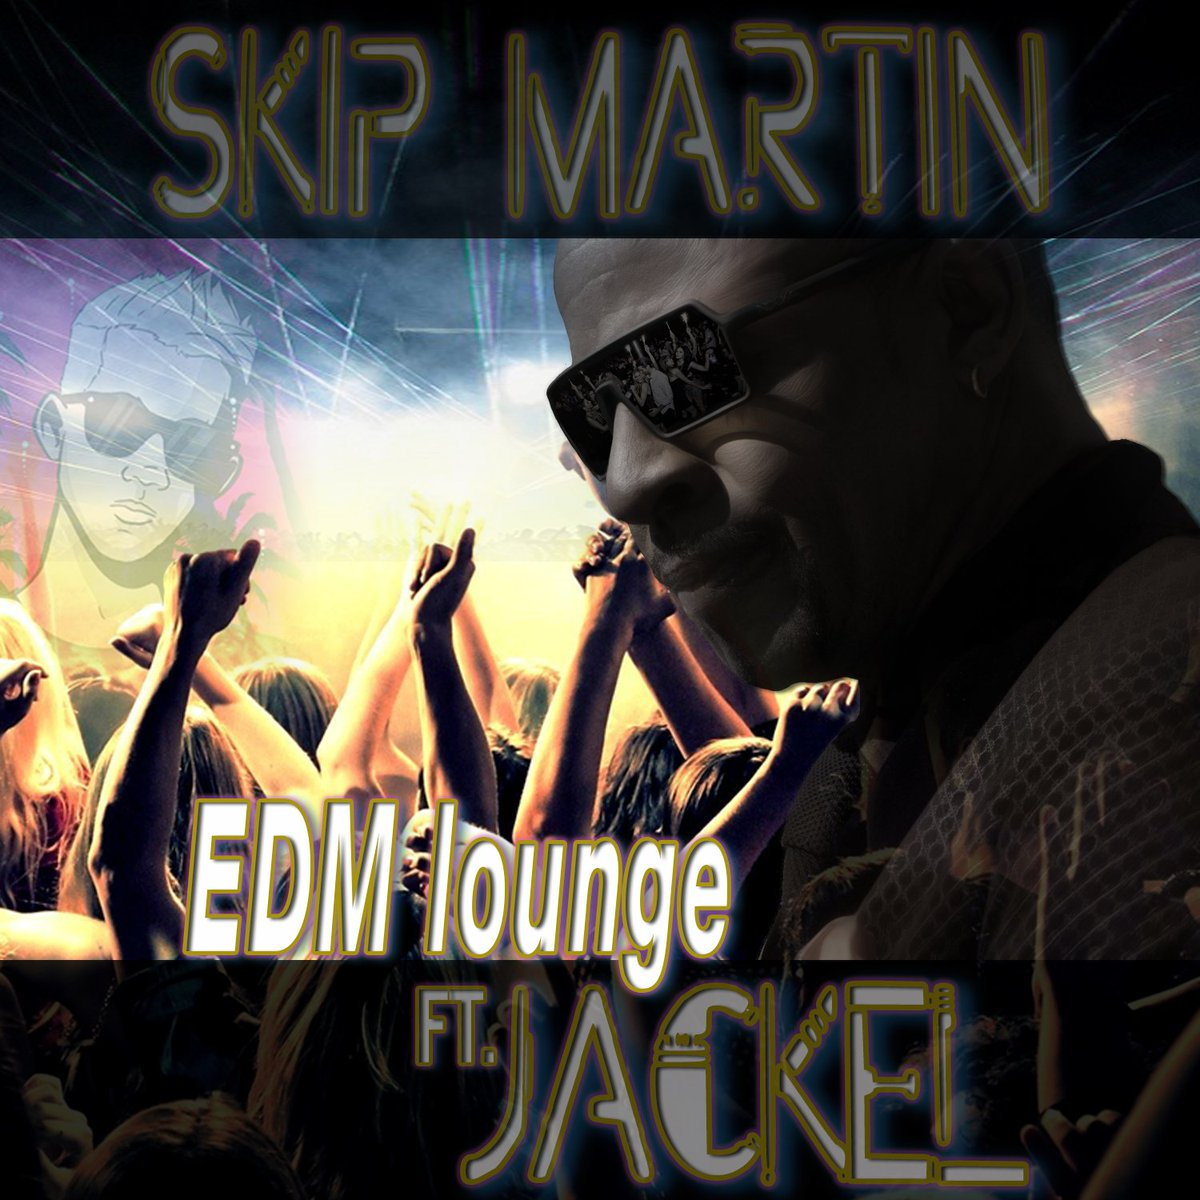 Skip Martin on Twitter: